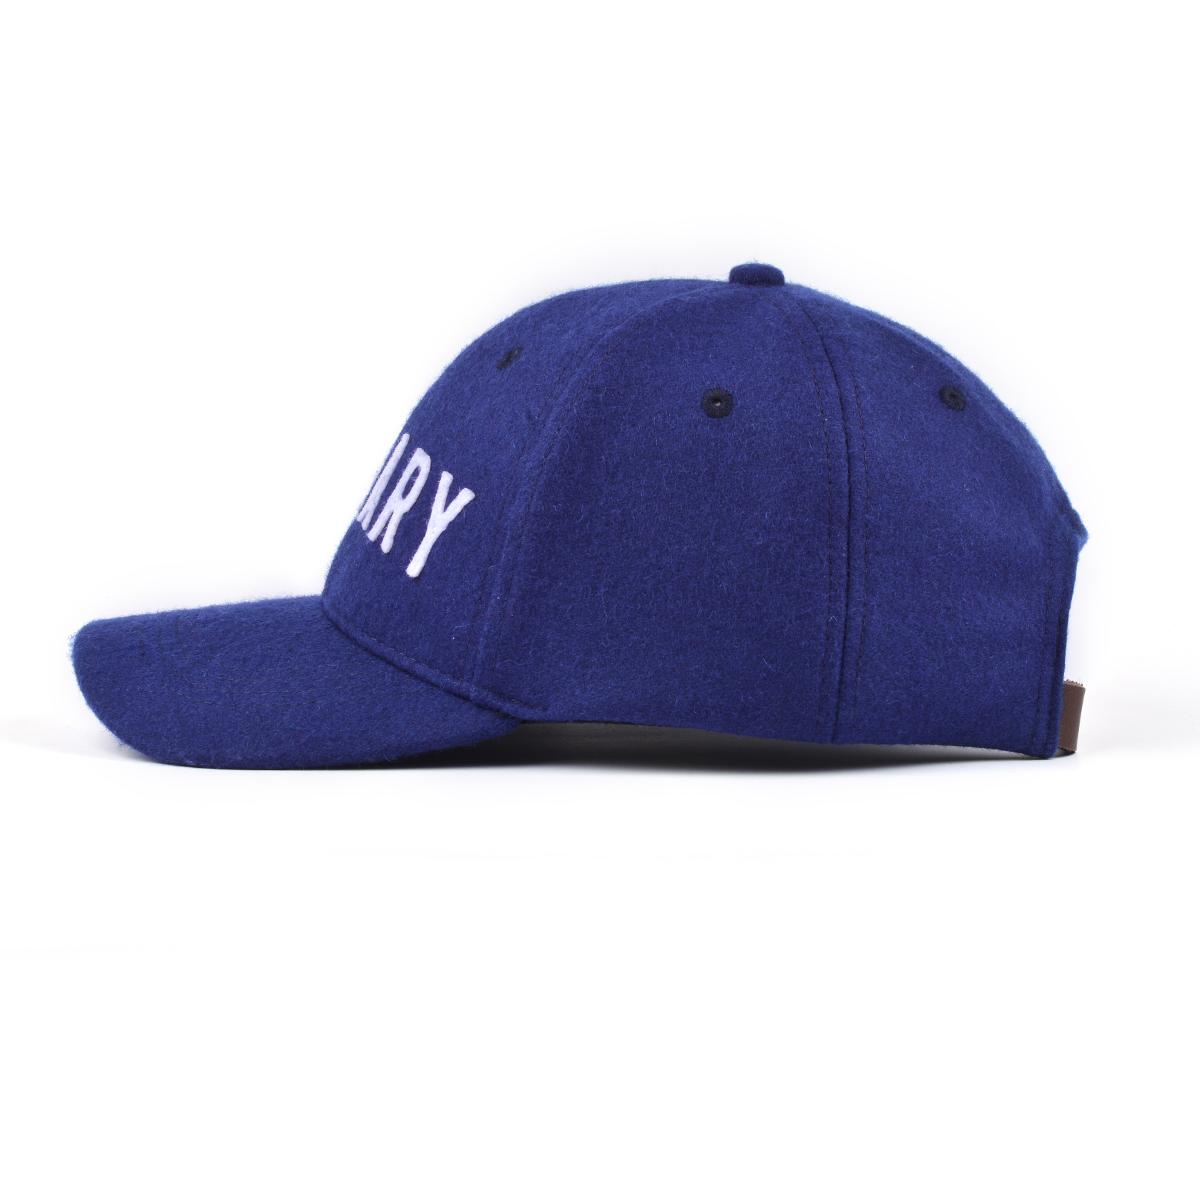 Library Hat Profile.JPG